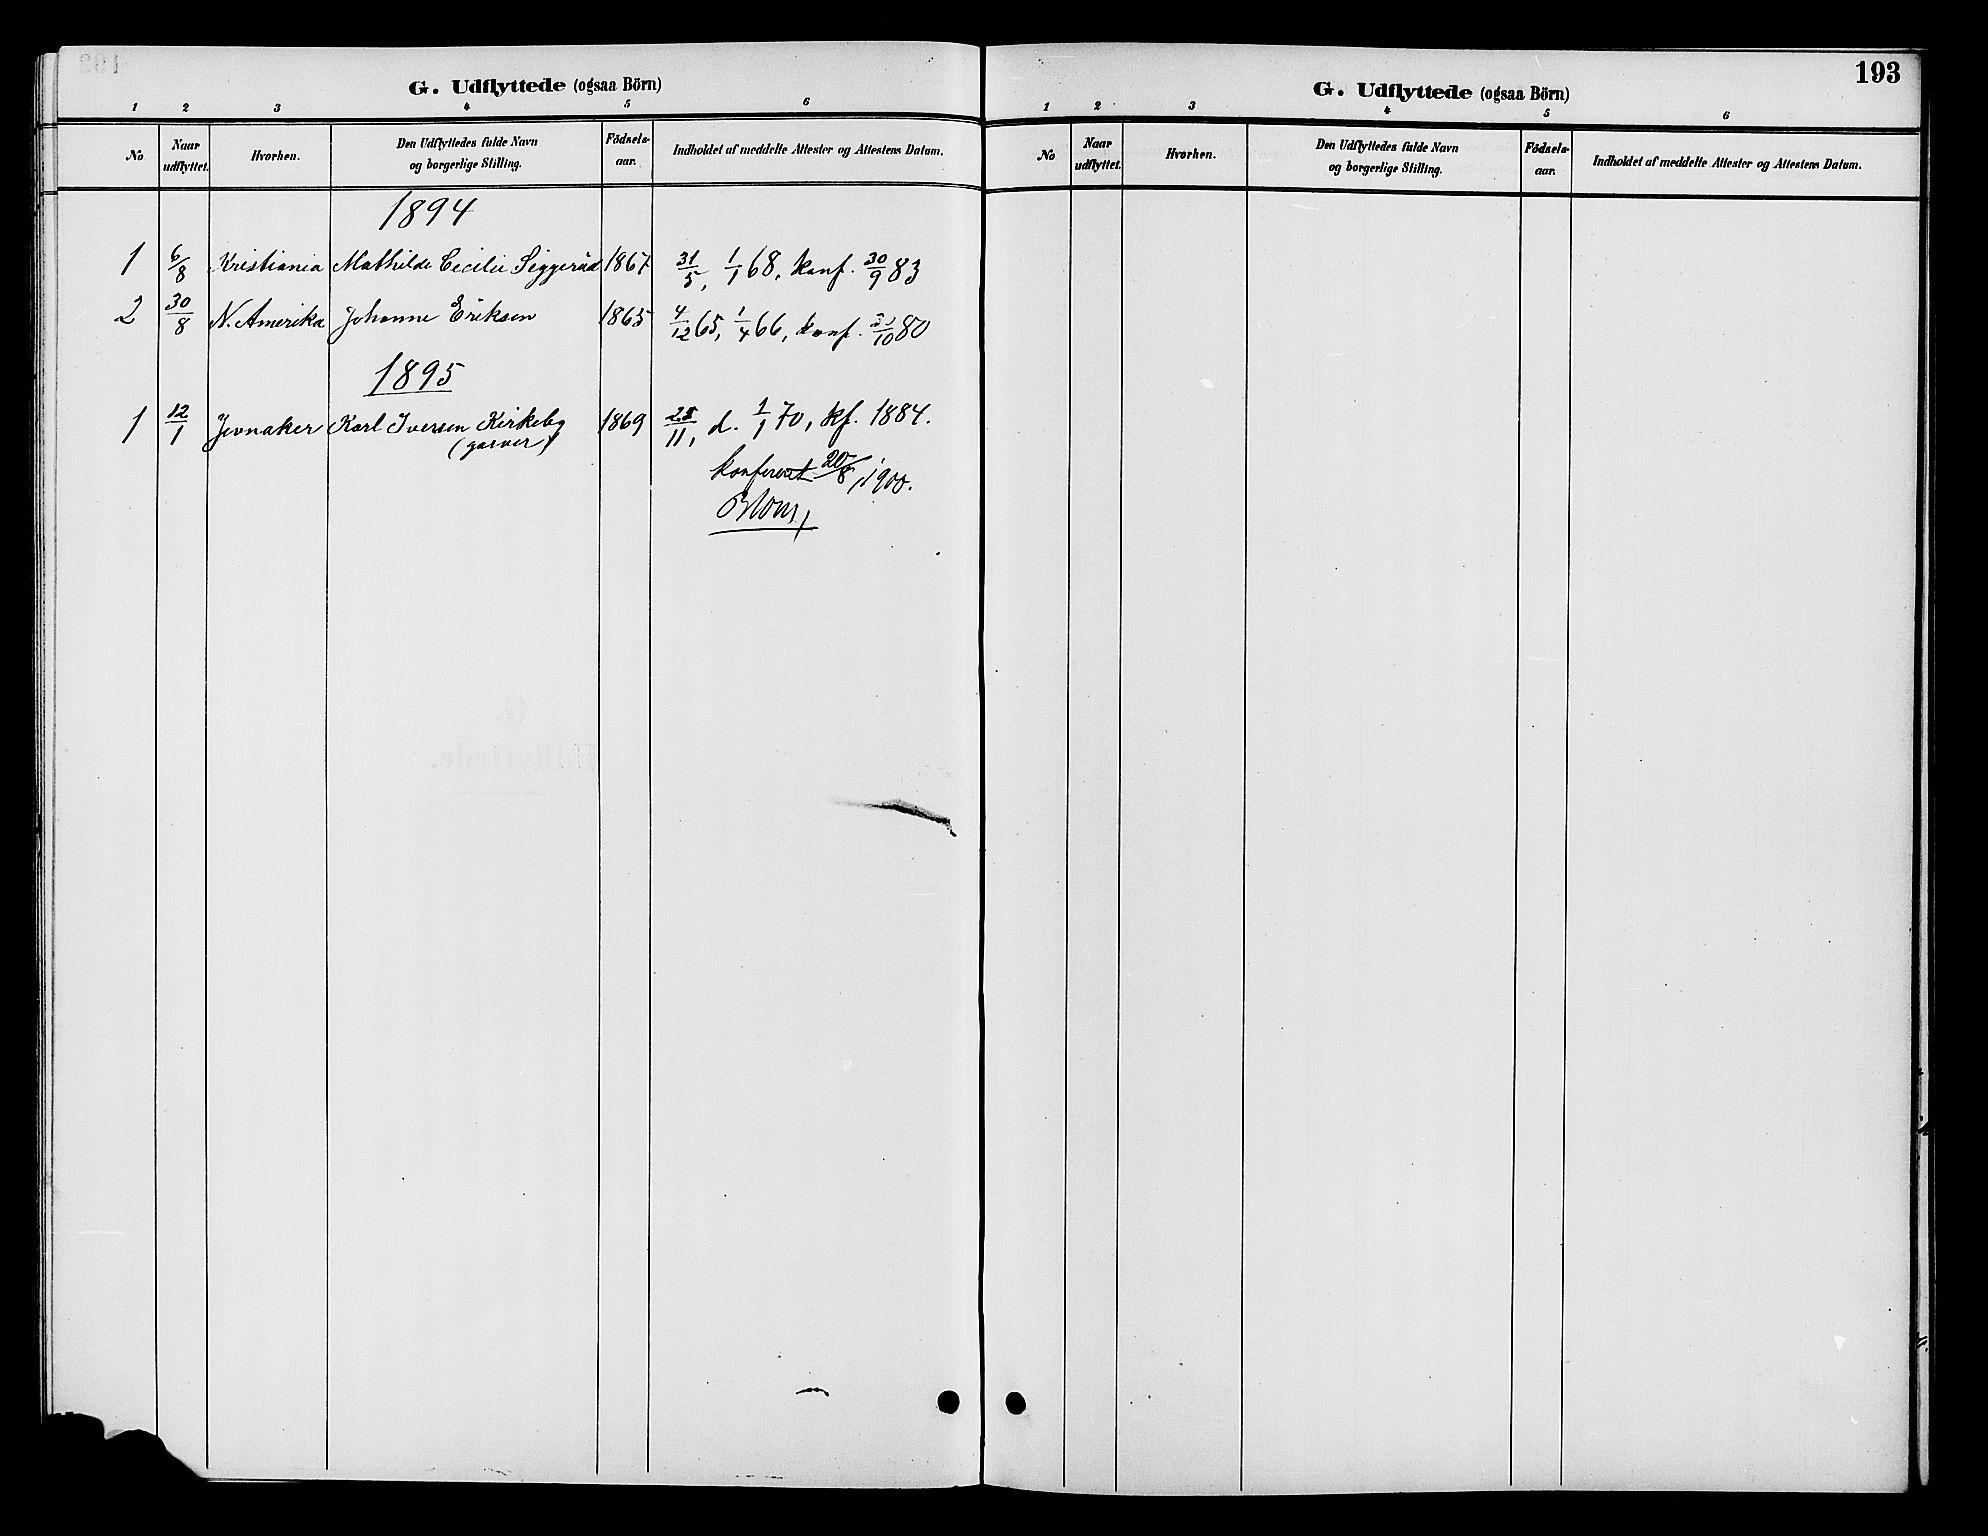 SAH, Vardal prestekontor, H/Ha/Hab/L0009: Klokkerbok nr. 9, 1894-1902, s. 193